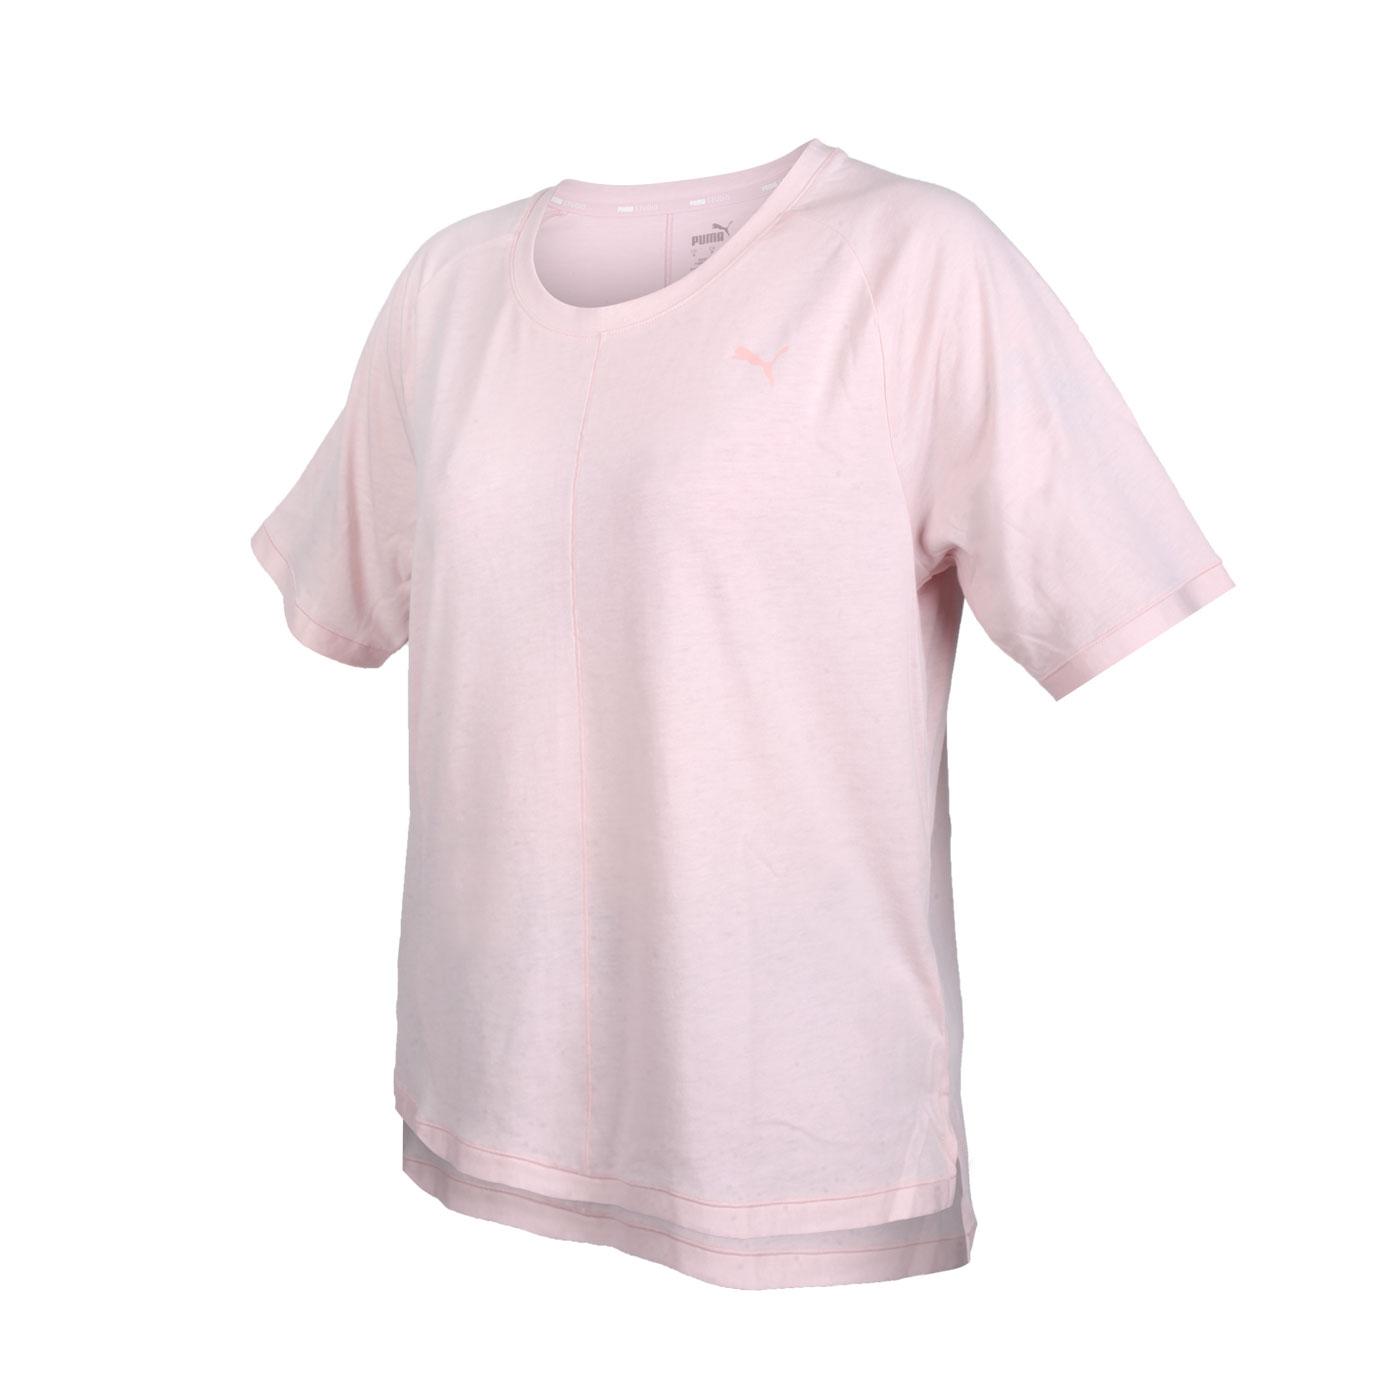 PUMA 女款瑜珈系列Studio寬鬆短袖T恤 52109336 - 粉紅